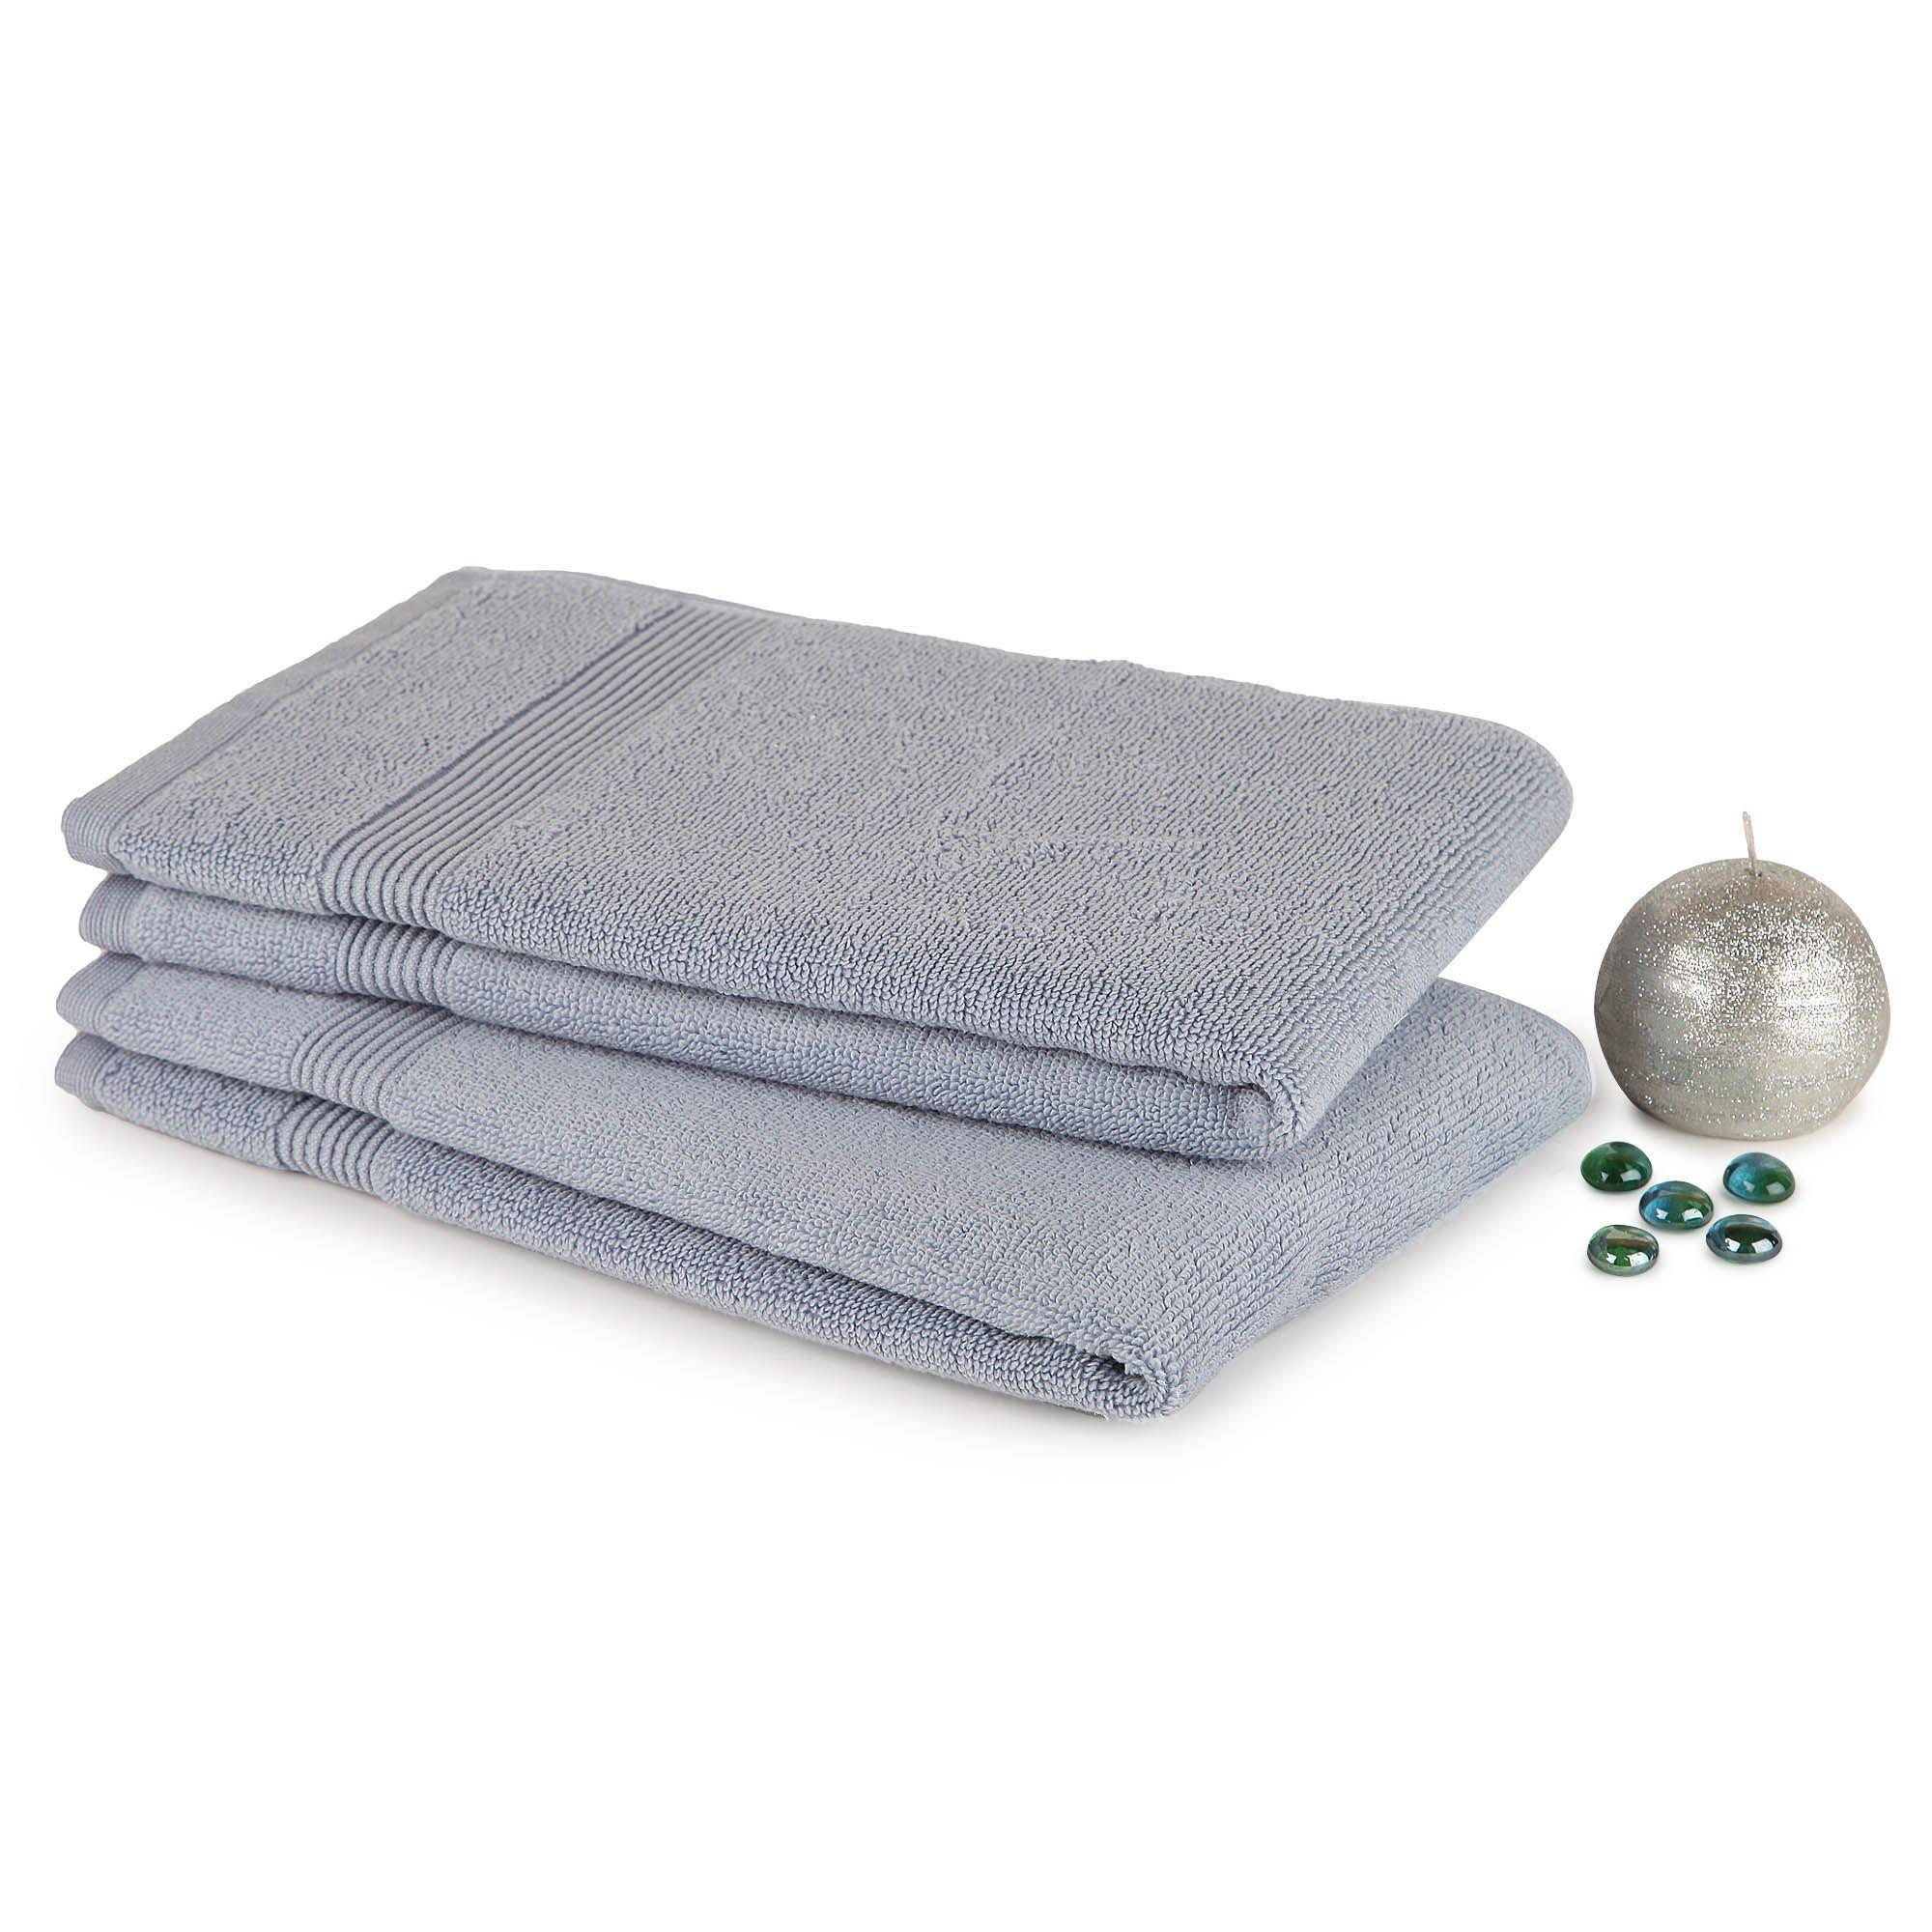 Buy Towels Online At Spaces Towel Hand Towel Sets Hand Towels